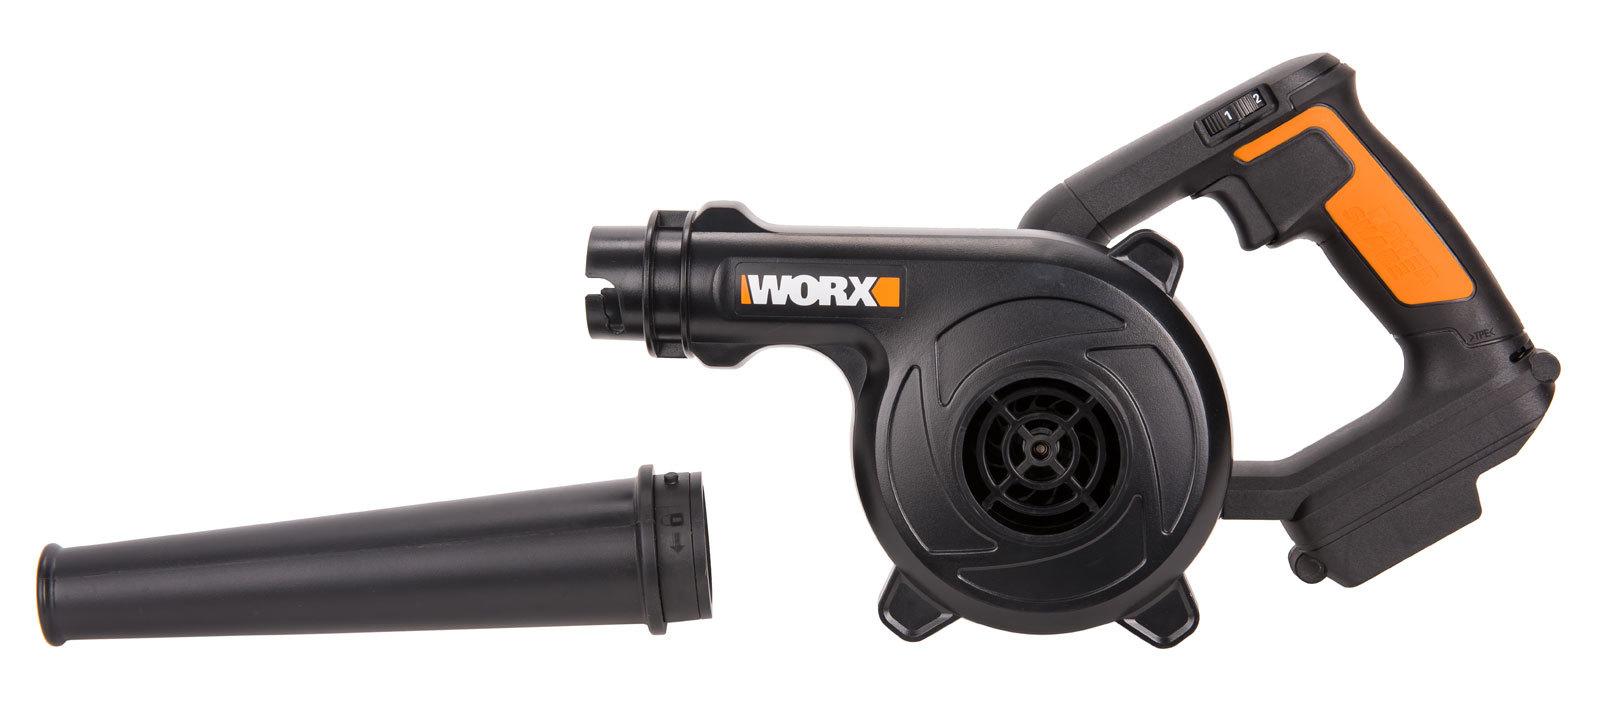 Воздуходувка аккумуляторная WORX WX094.9, 20В, без АКБ и ЗУ